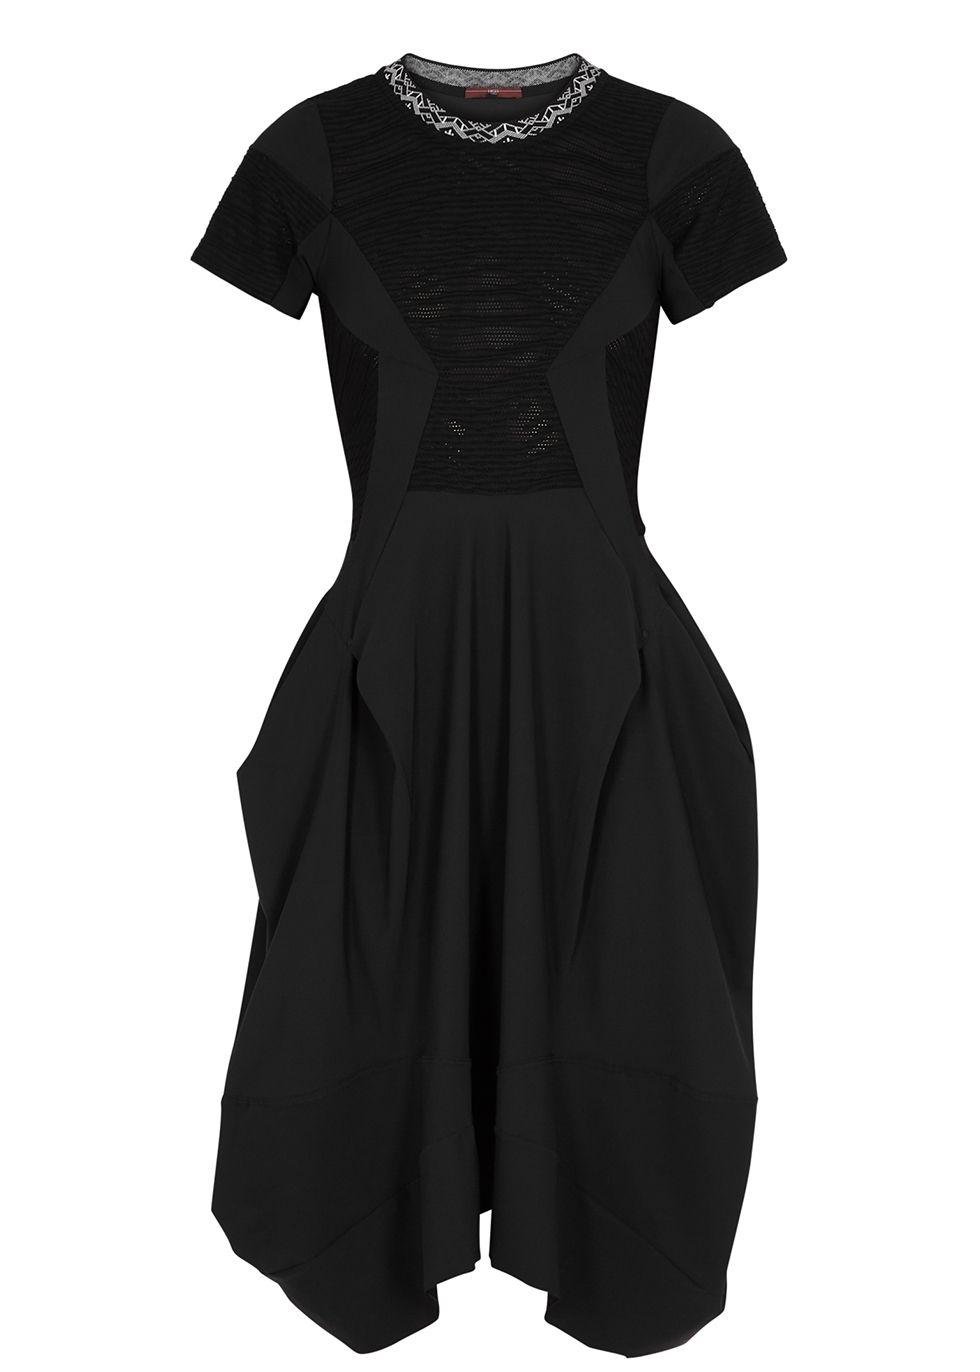 Harvey Nichols High Praise Black Jersey Midi Dress 365 00 Black Jersey Midi Dress Weekend Dresses Dress 365 [ 1372 x 980 Pixel ]